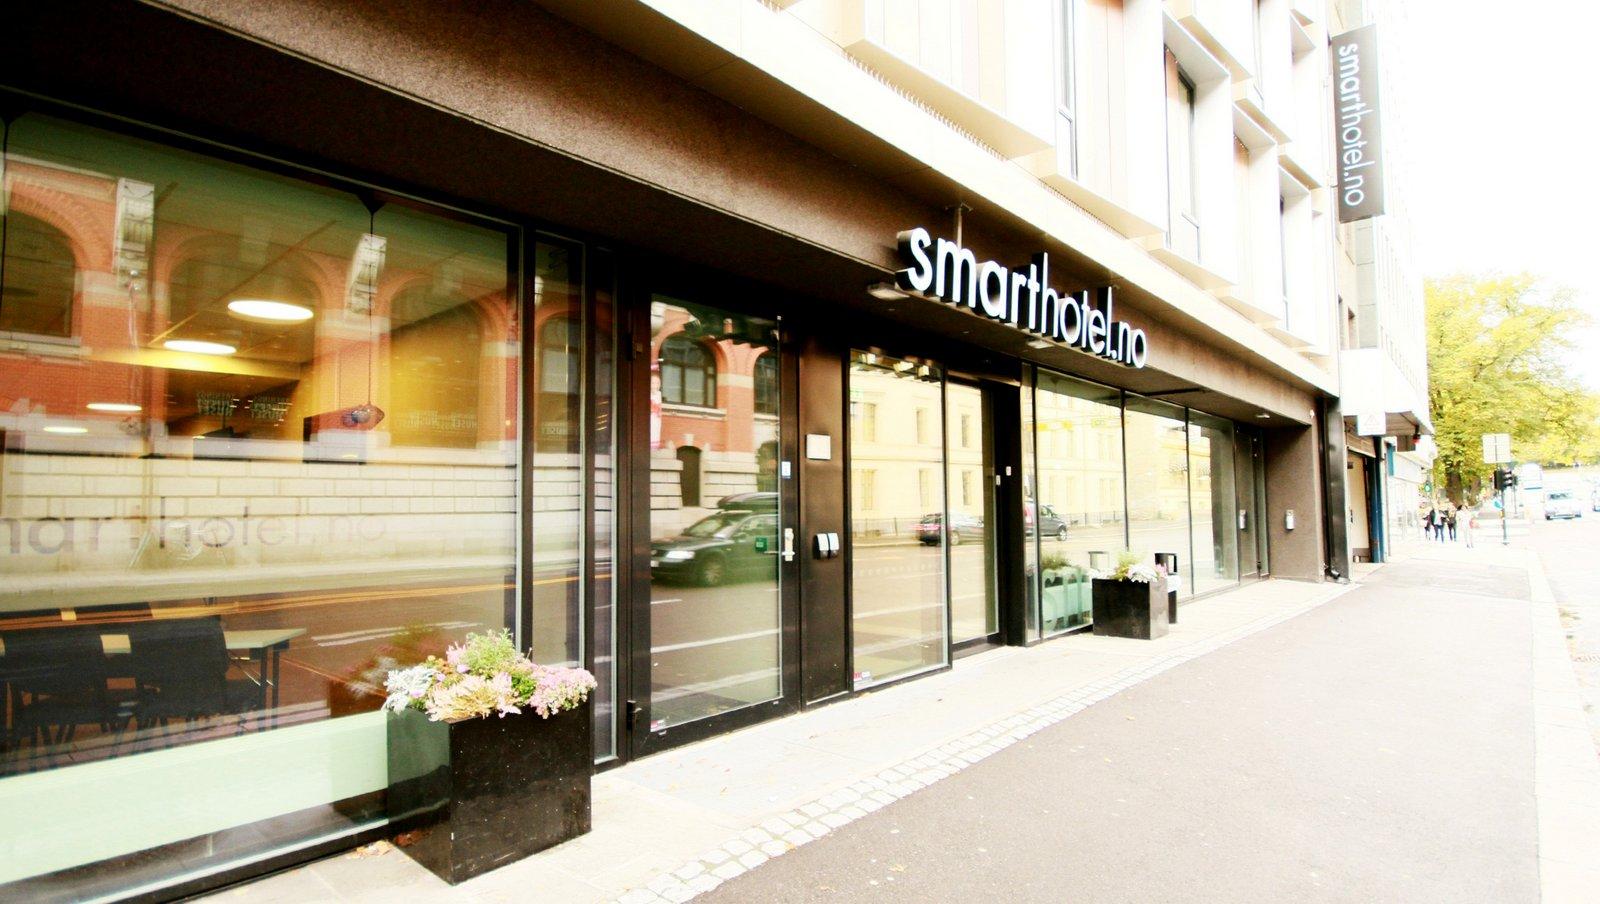 Smarthotell-Fasade2